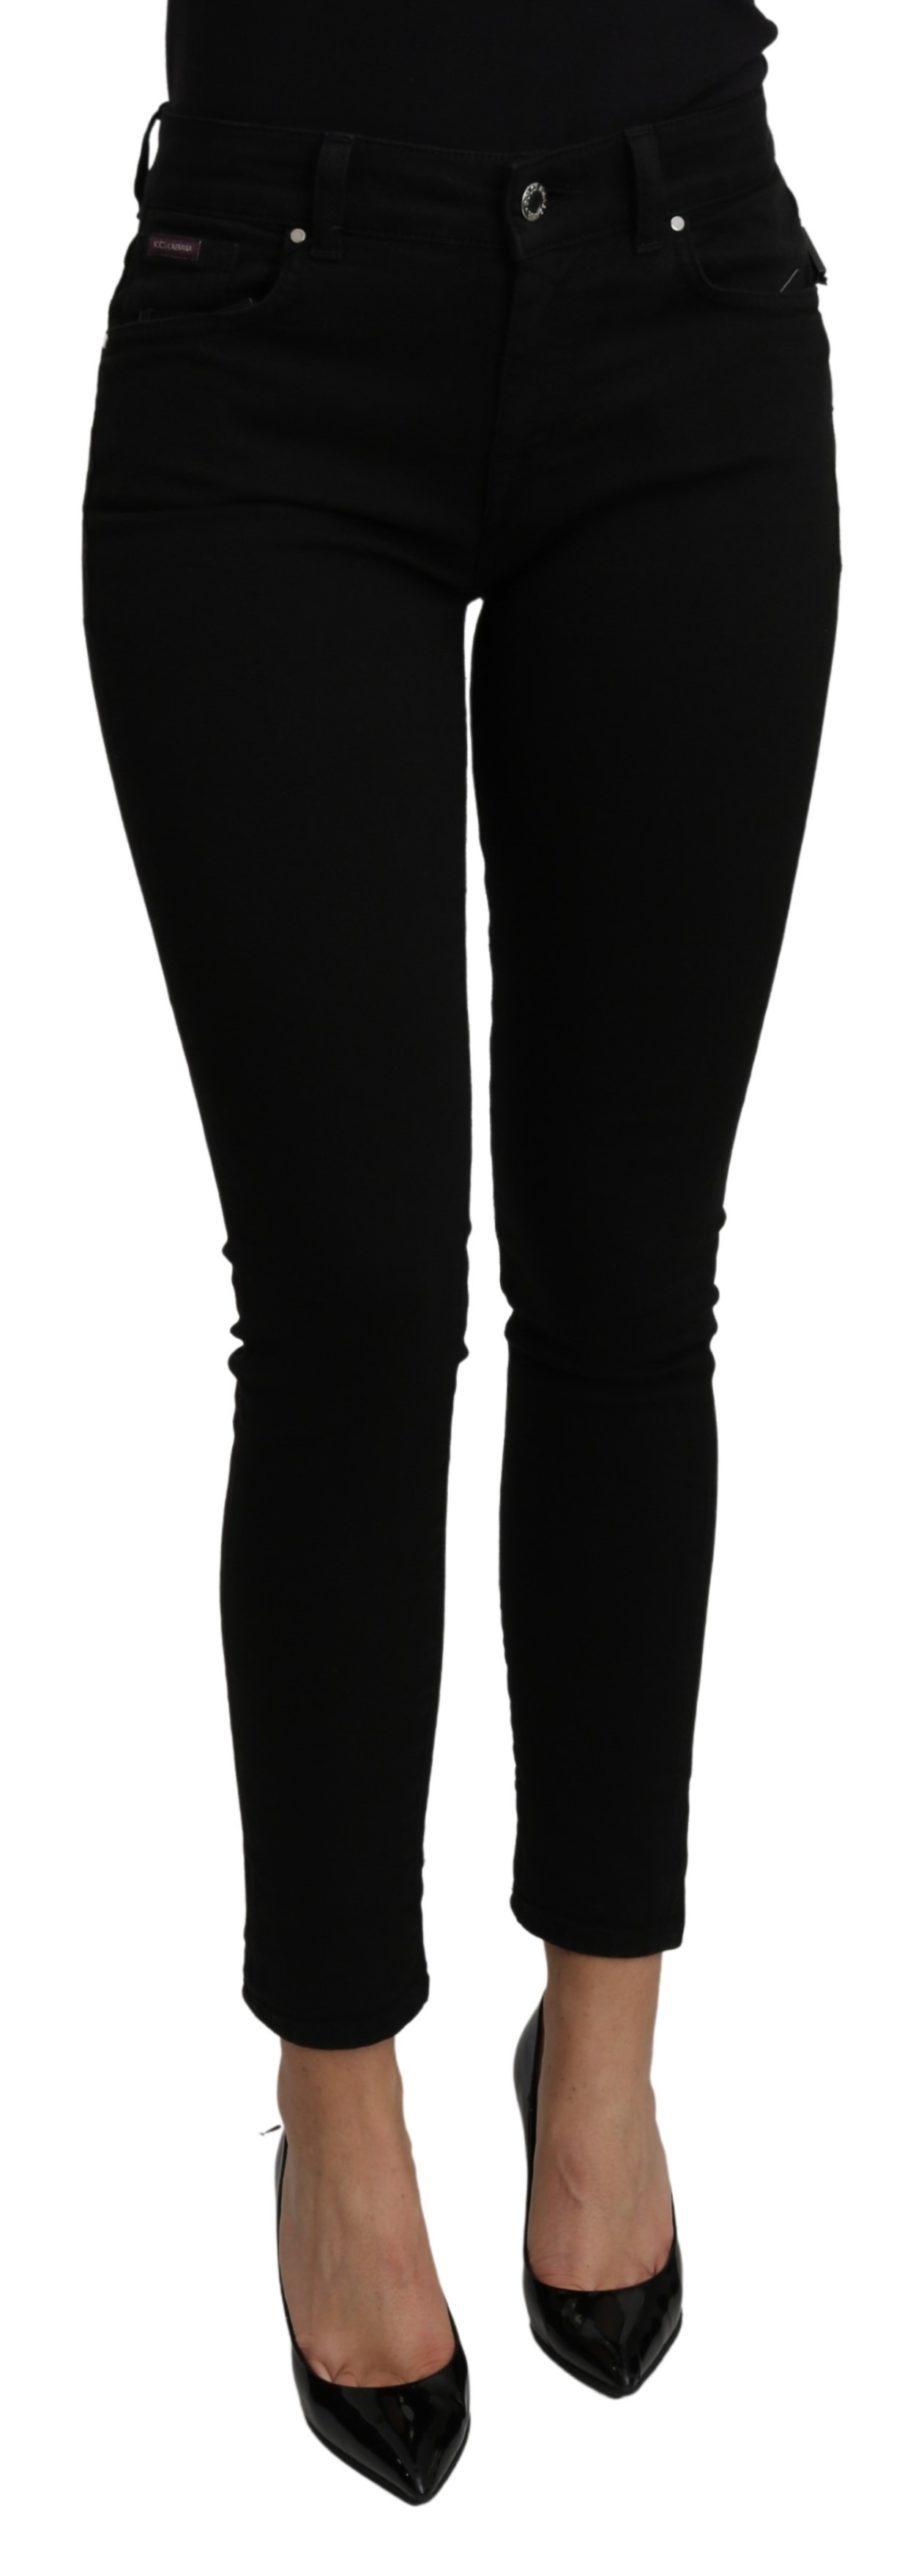 Dolce & Gabbana Women's Mid Waist Slim Fit Cotton Jeans Black PAN71105 - IT38|XS